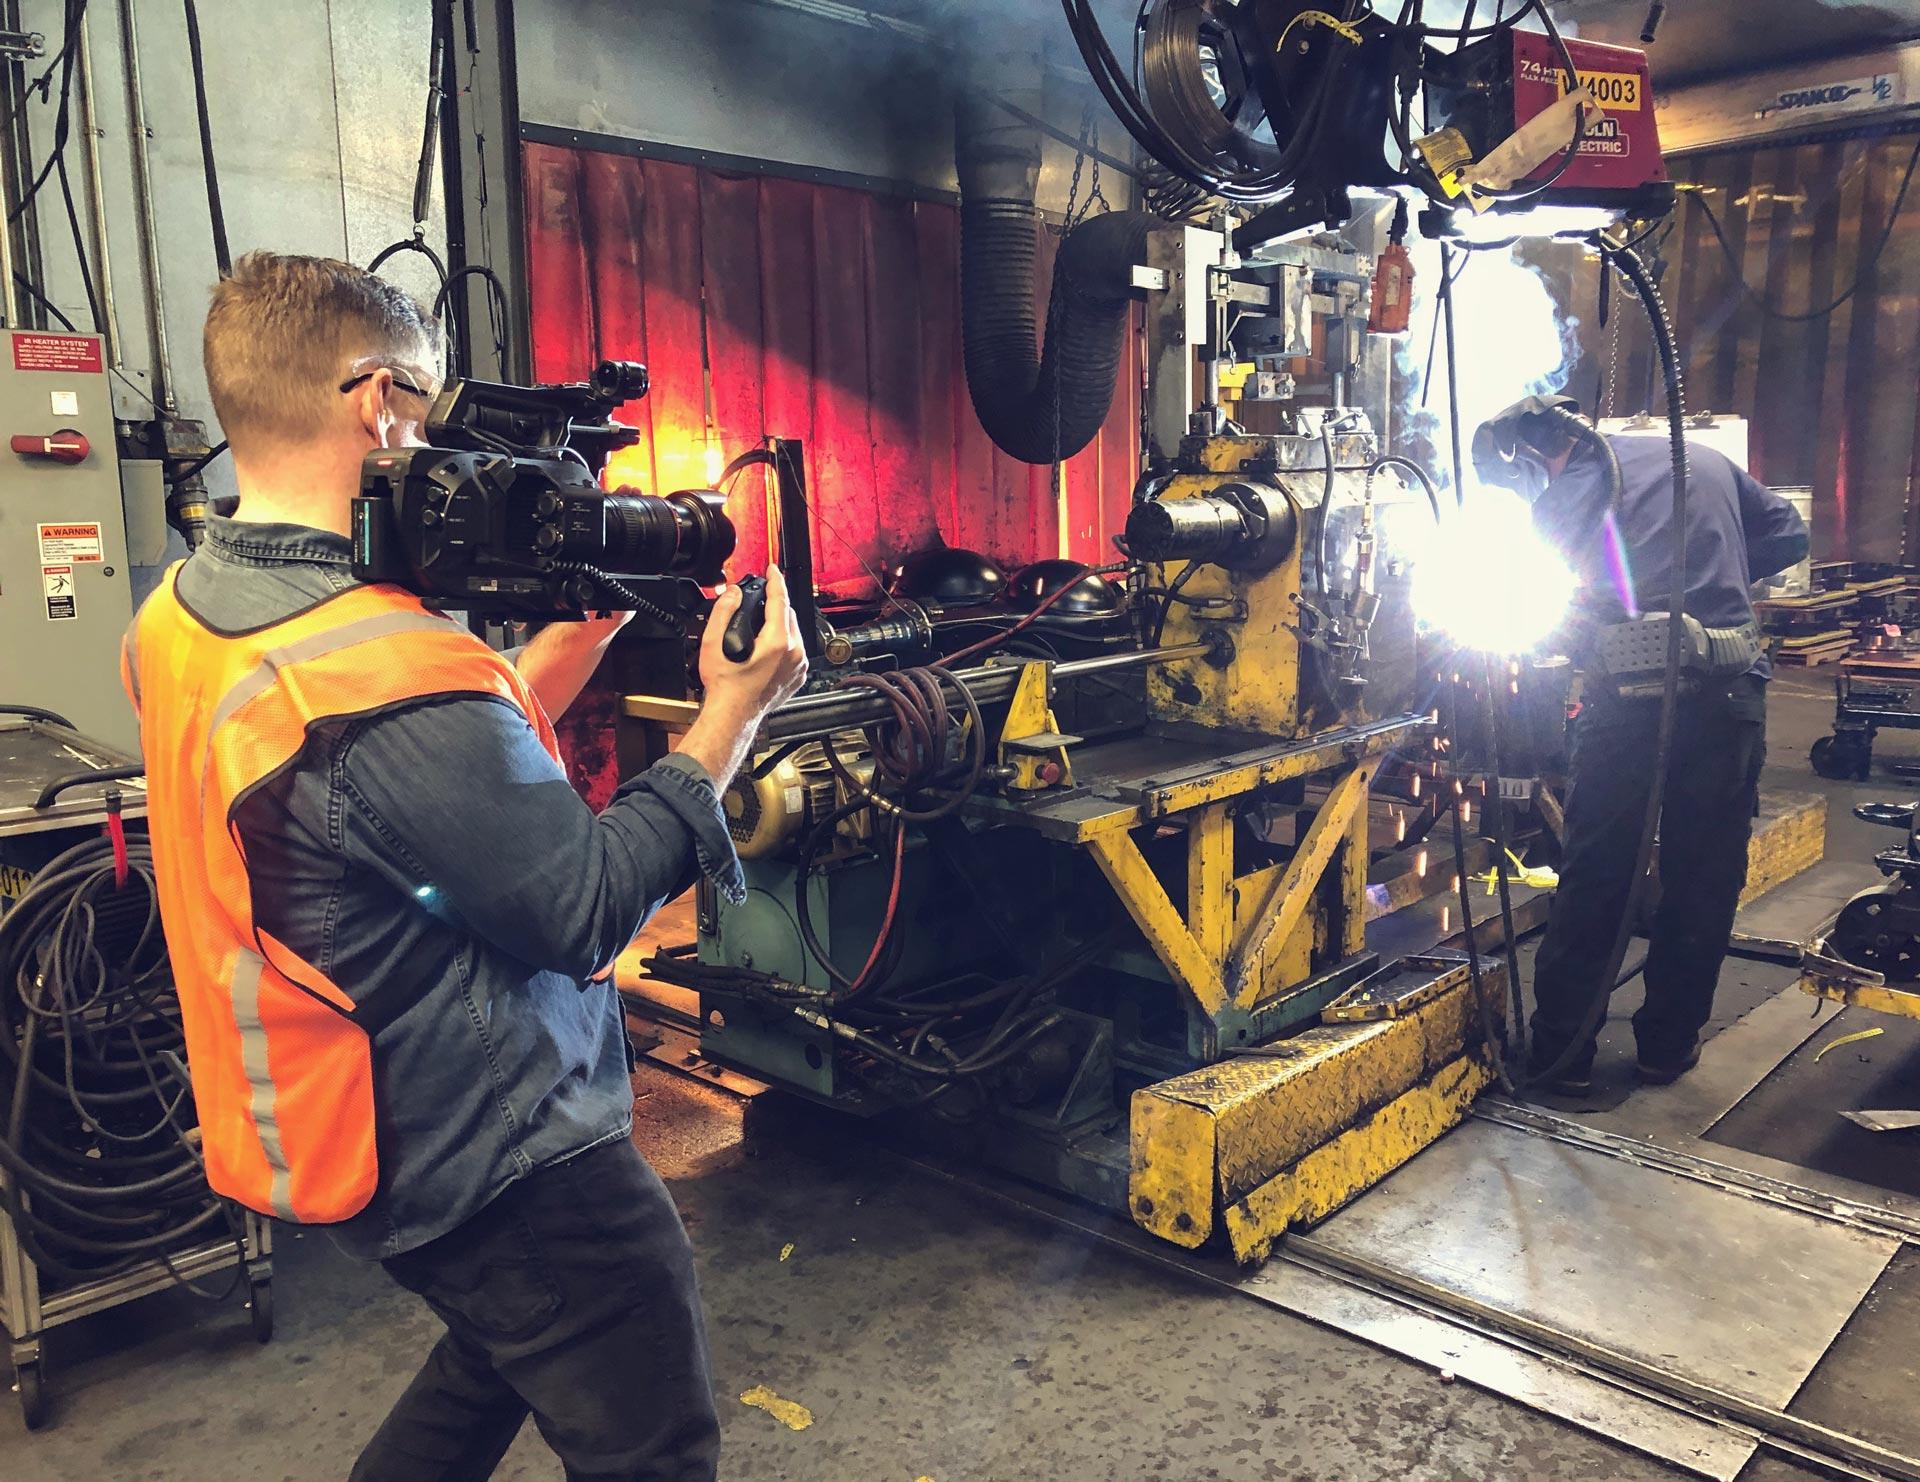 a cameraman in an orange vest filming a welder manufacturing an engine